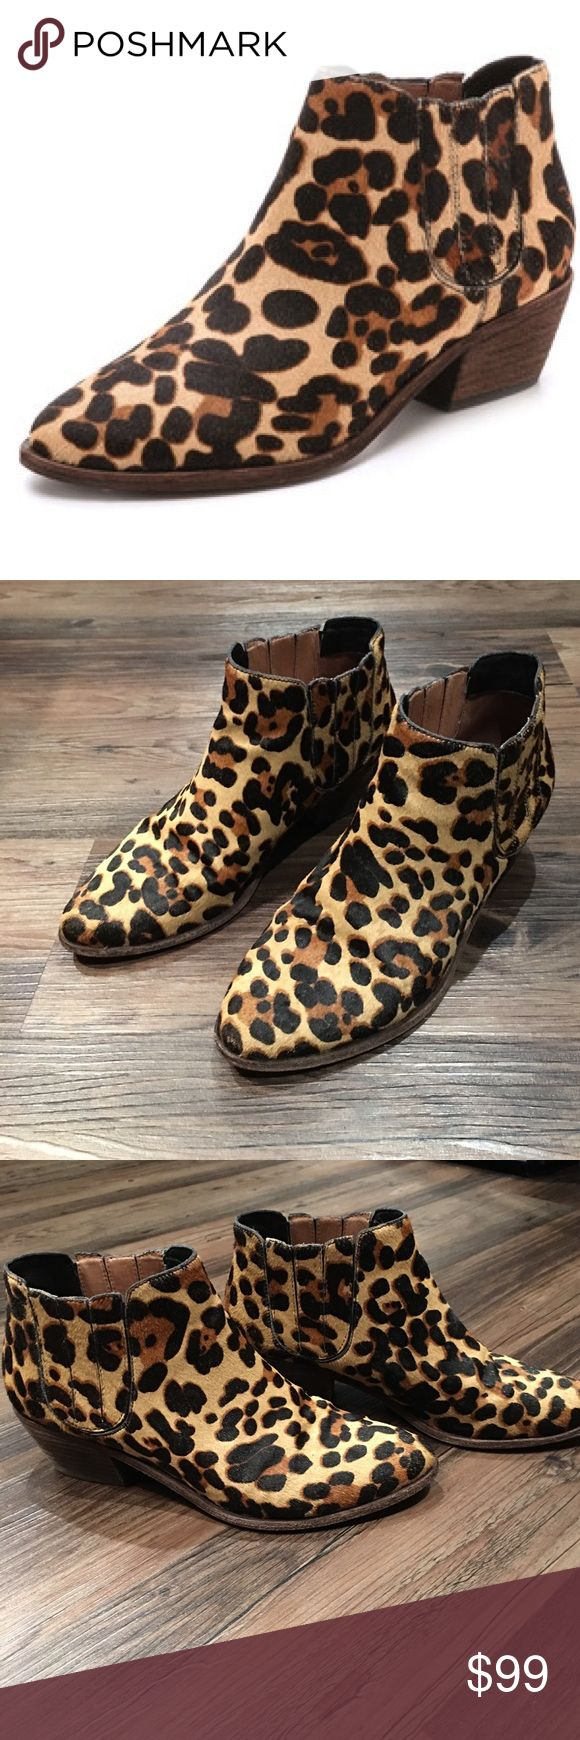 Joie Calf Hair Leopard Booties Joie Calf Hair Leopard Booties Joie Shoes Ankle Boots & Booties